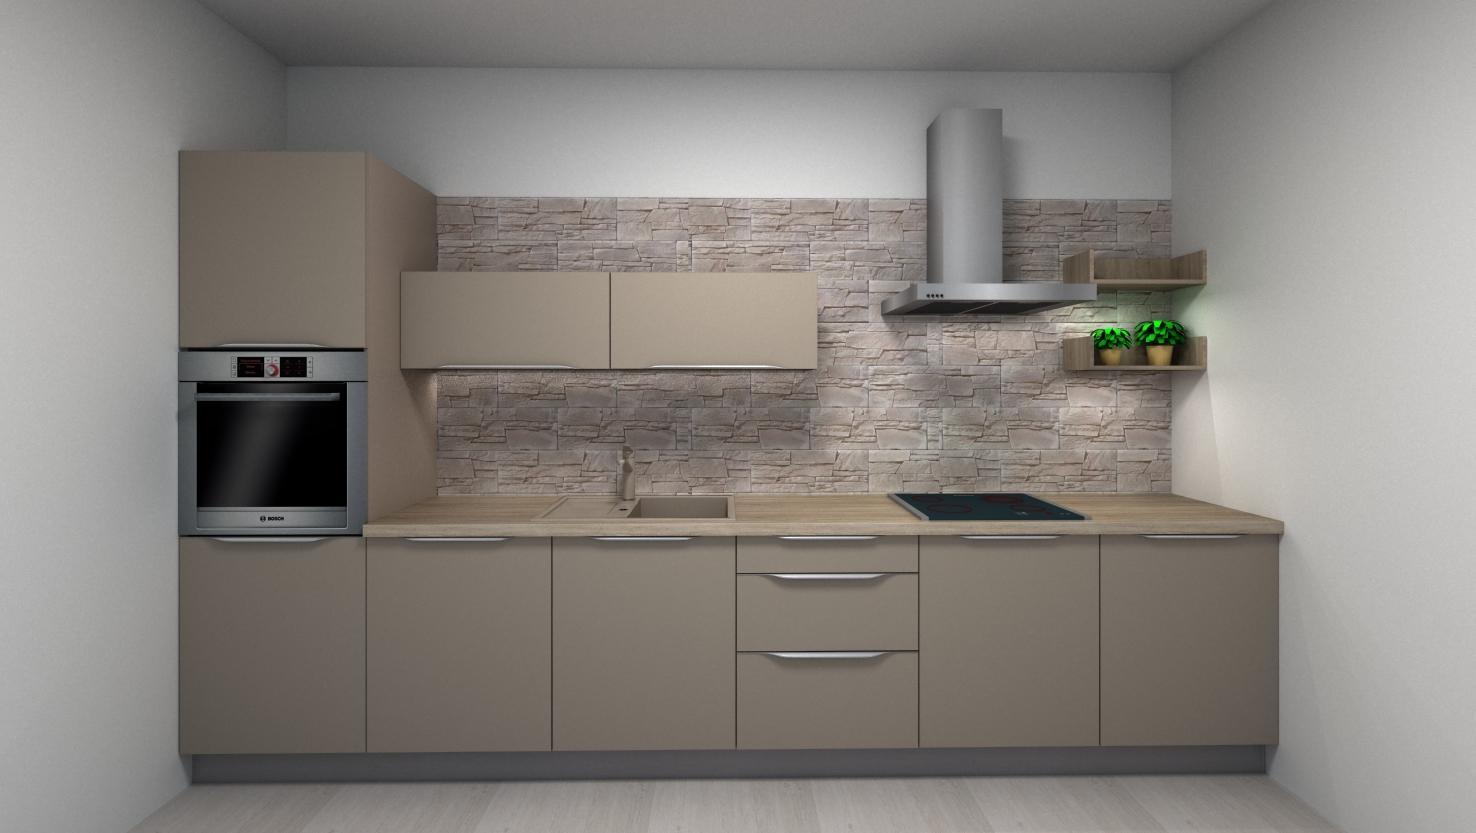 Kuchyne - Obrázok č. 58